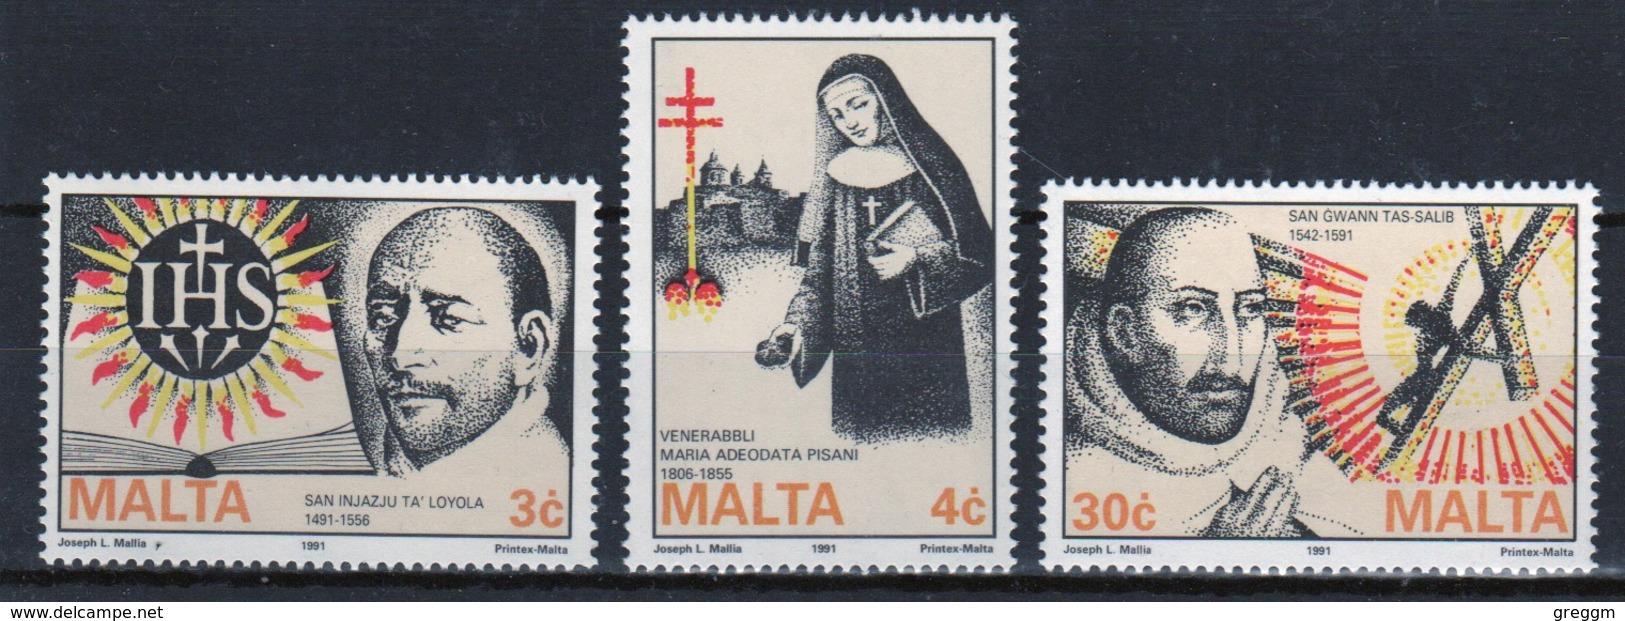 Malta 1991 Set Of Stamps To Celebrate Religious Events. - Malta